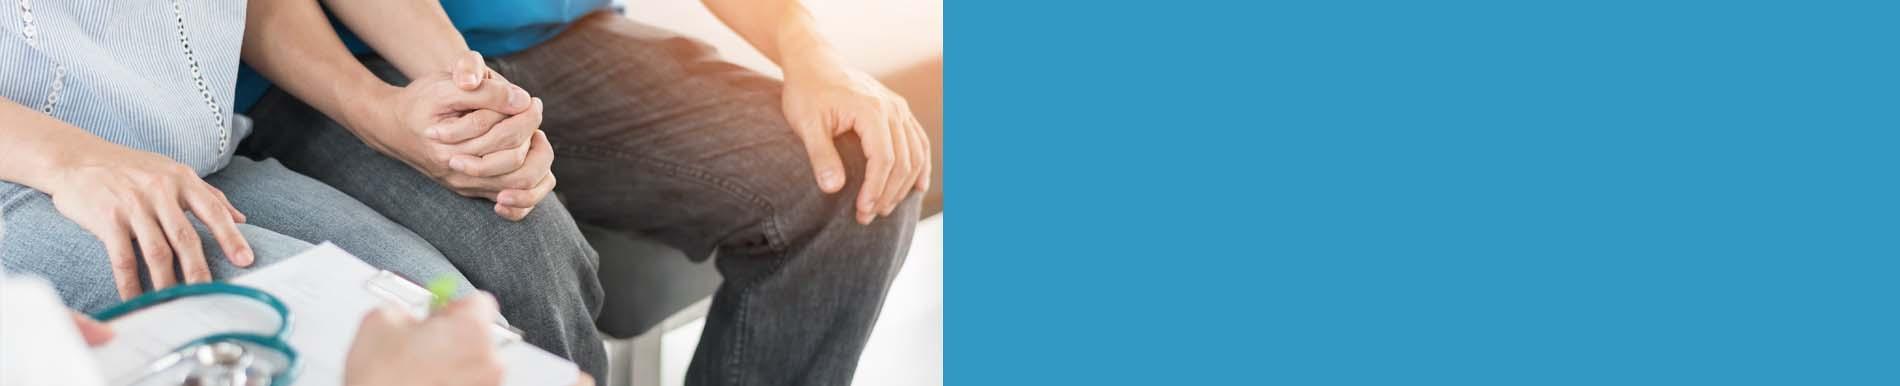 https://www.healthychildren.org/SiteCollectionImage-Homepage-Banners/Cervical_Cancer_Banner.jpg